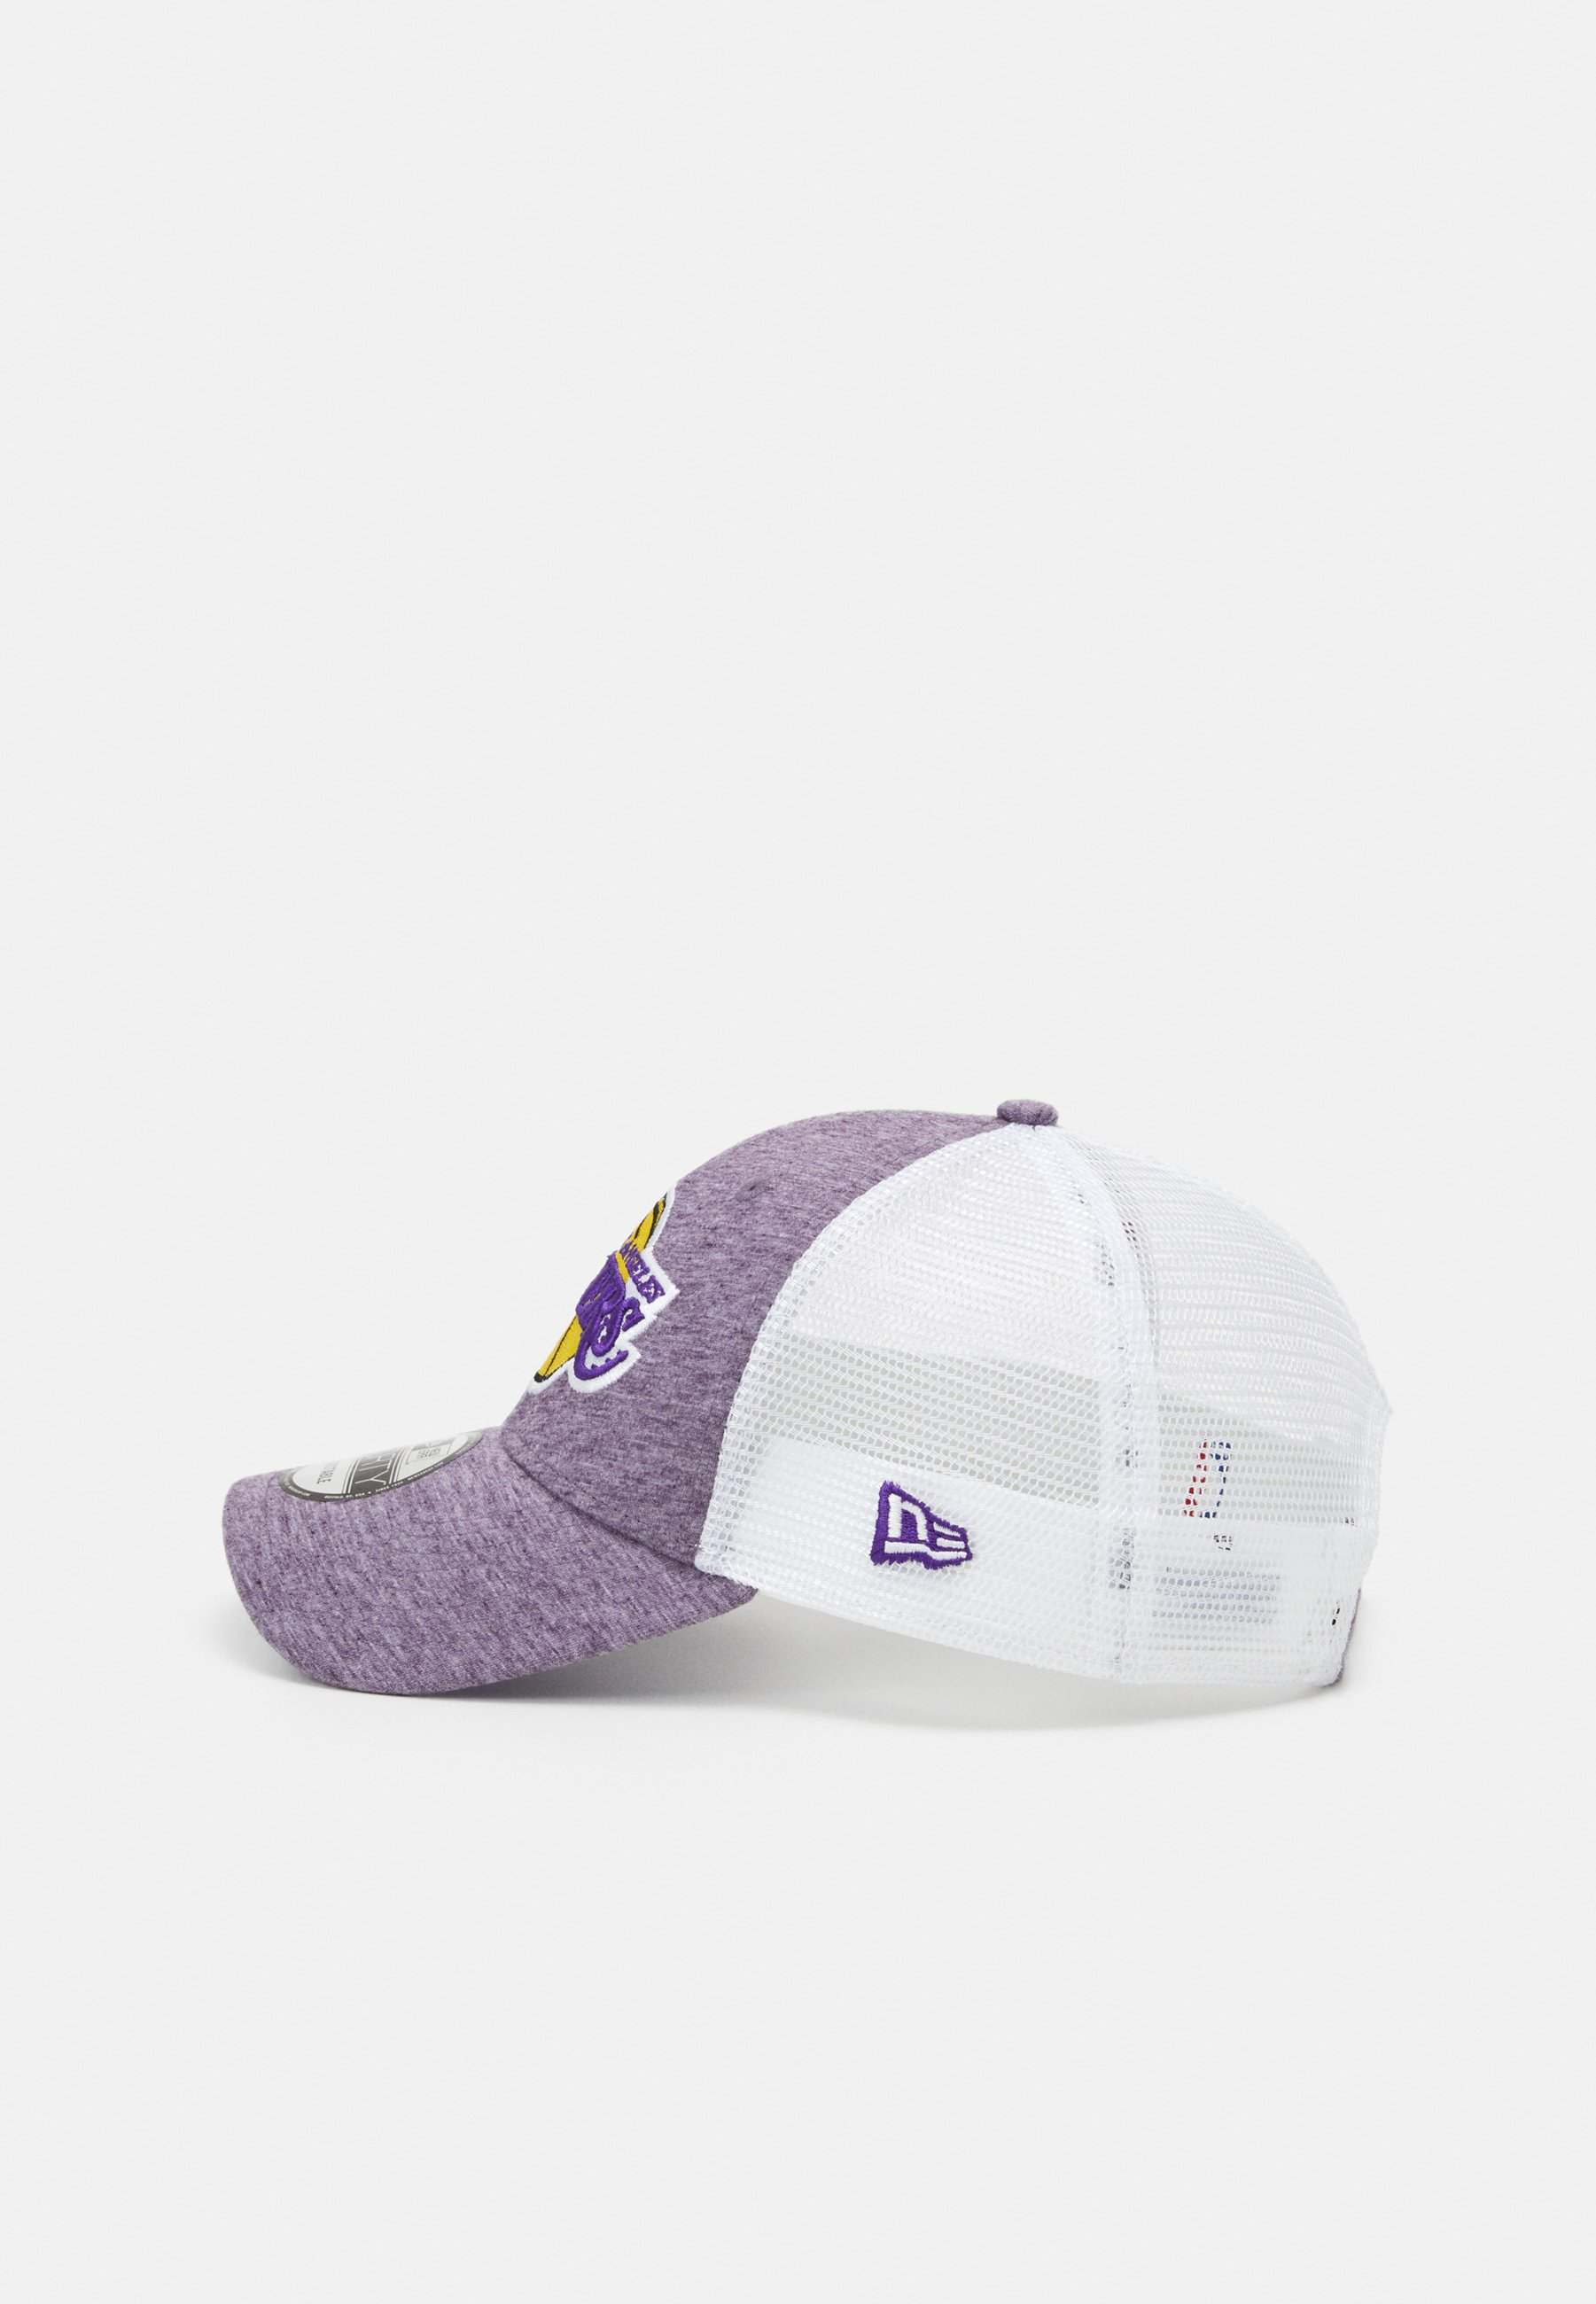 New Era SUMMER LEAGUE 9FORTY NEYYAN - Cap - purple/white/lilla YOIPX2gcxuzI8Eh